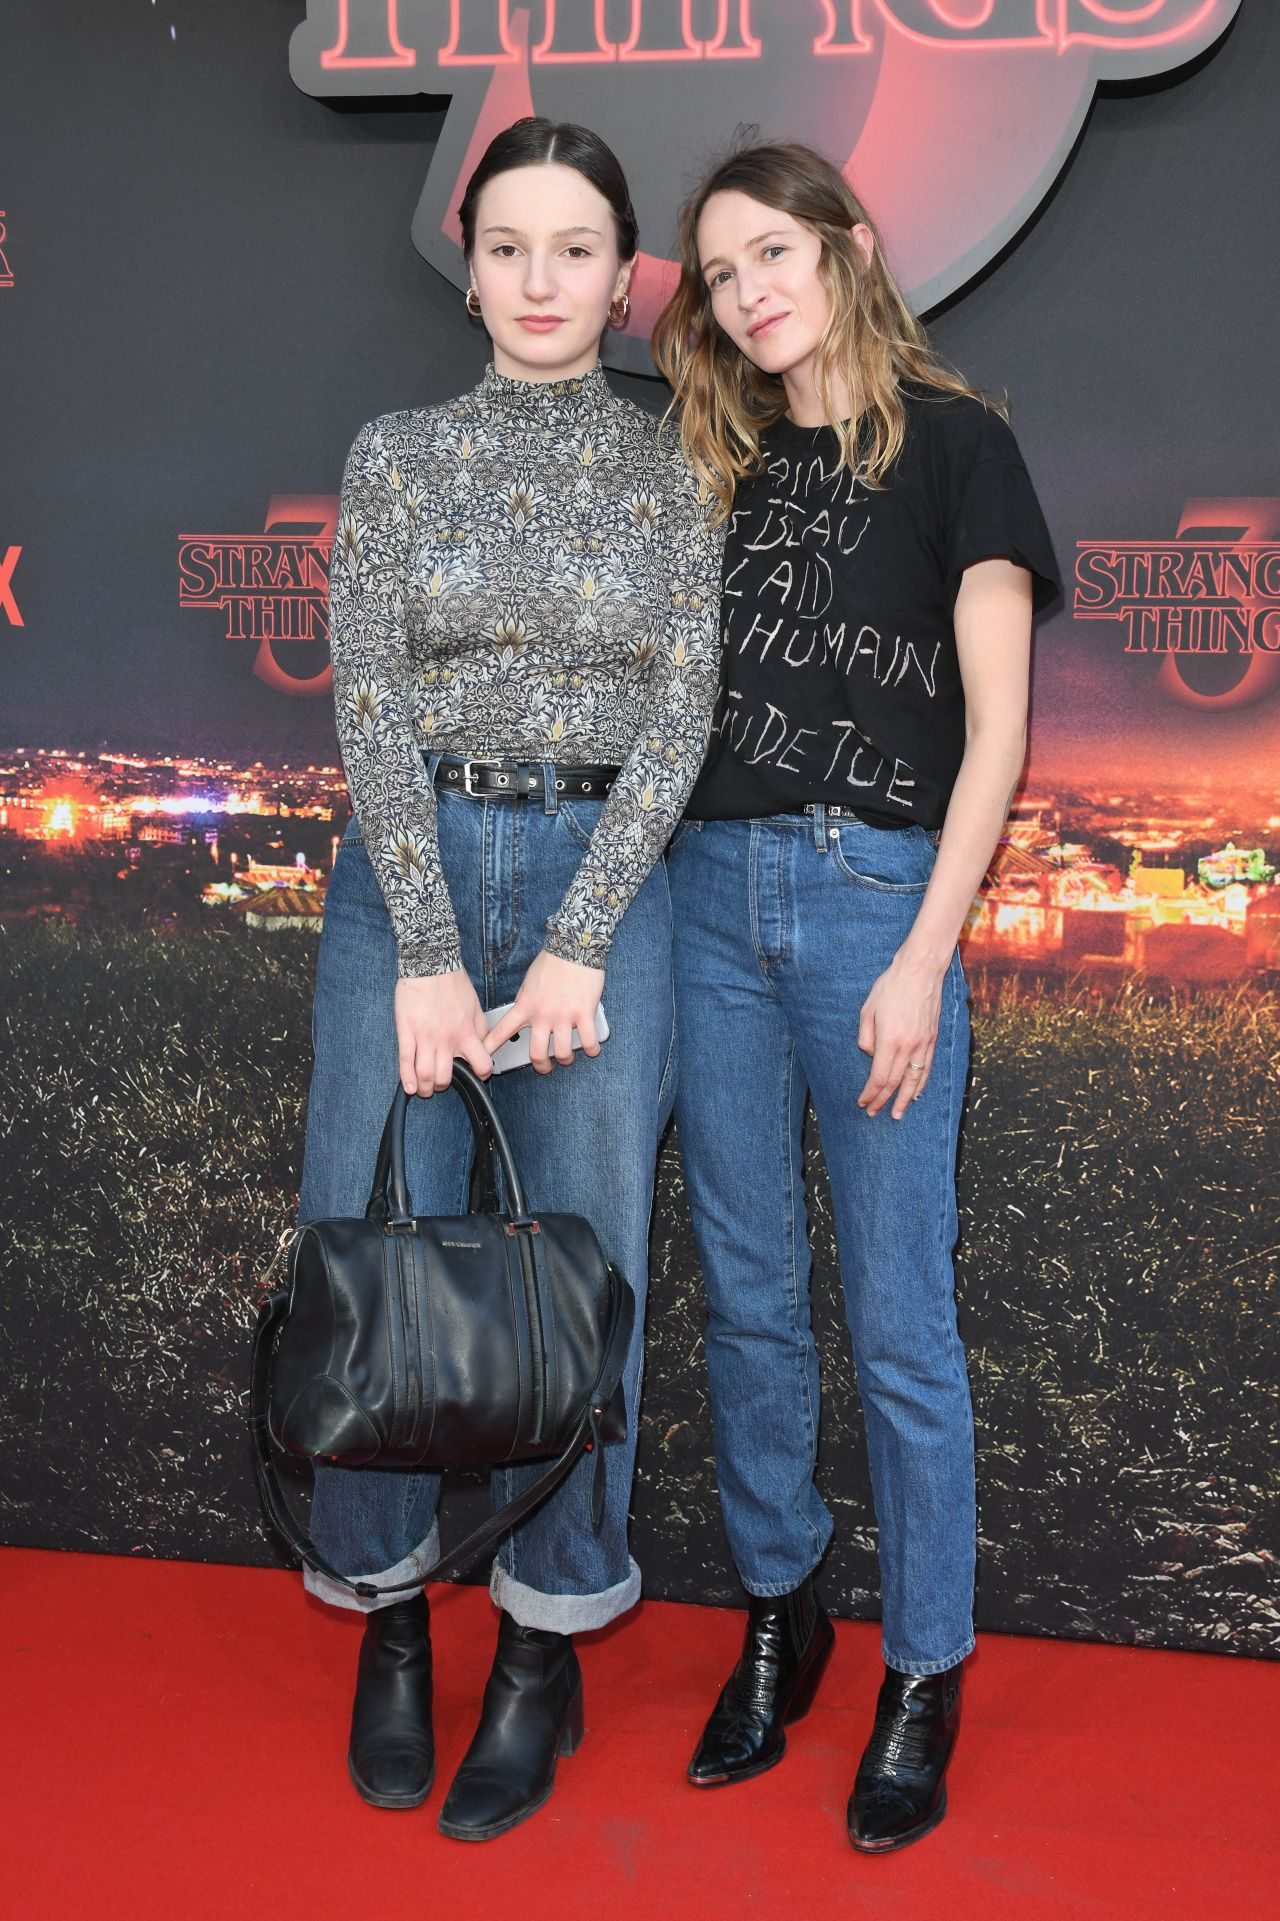 Christa Teret Stranger Things Season 3 Premiere In Paris